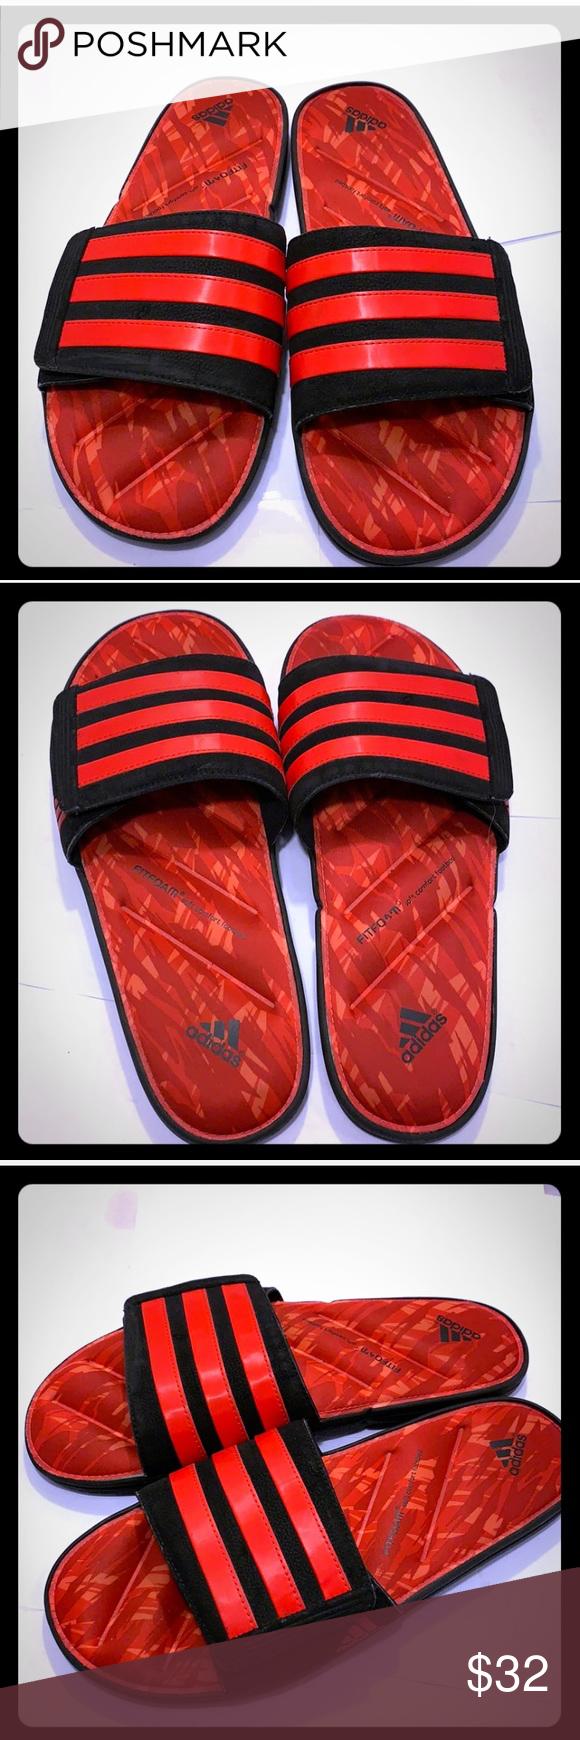 Adidas FitFoam Men's Slip On Sandals